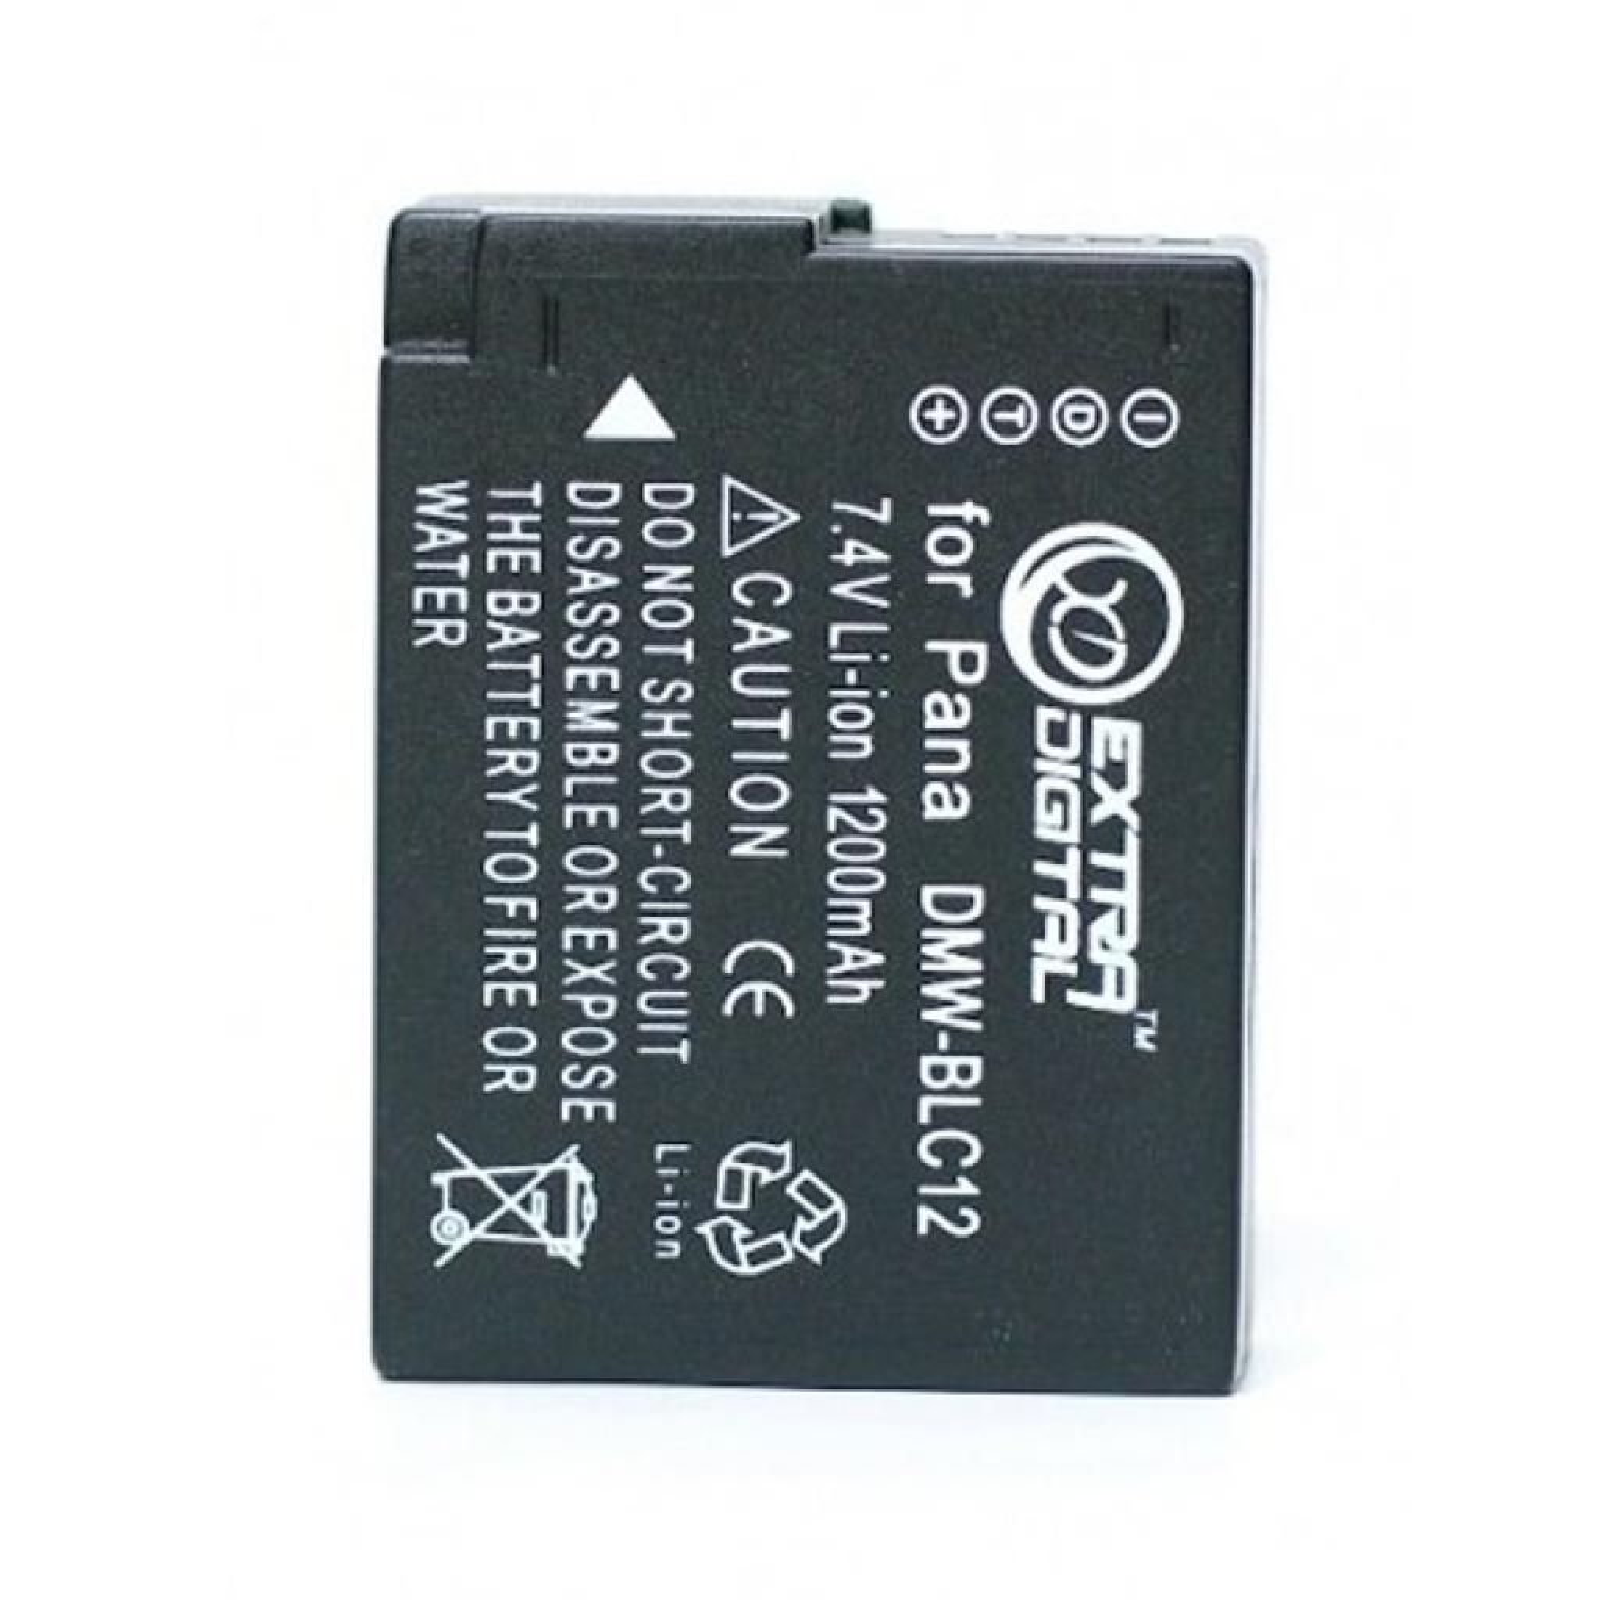 Аккумулятор к фото/видео EXTRADIGITAL Panasonic DMW-BLC12 (BDP2567)